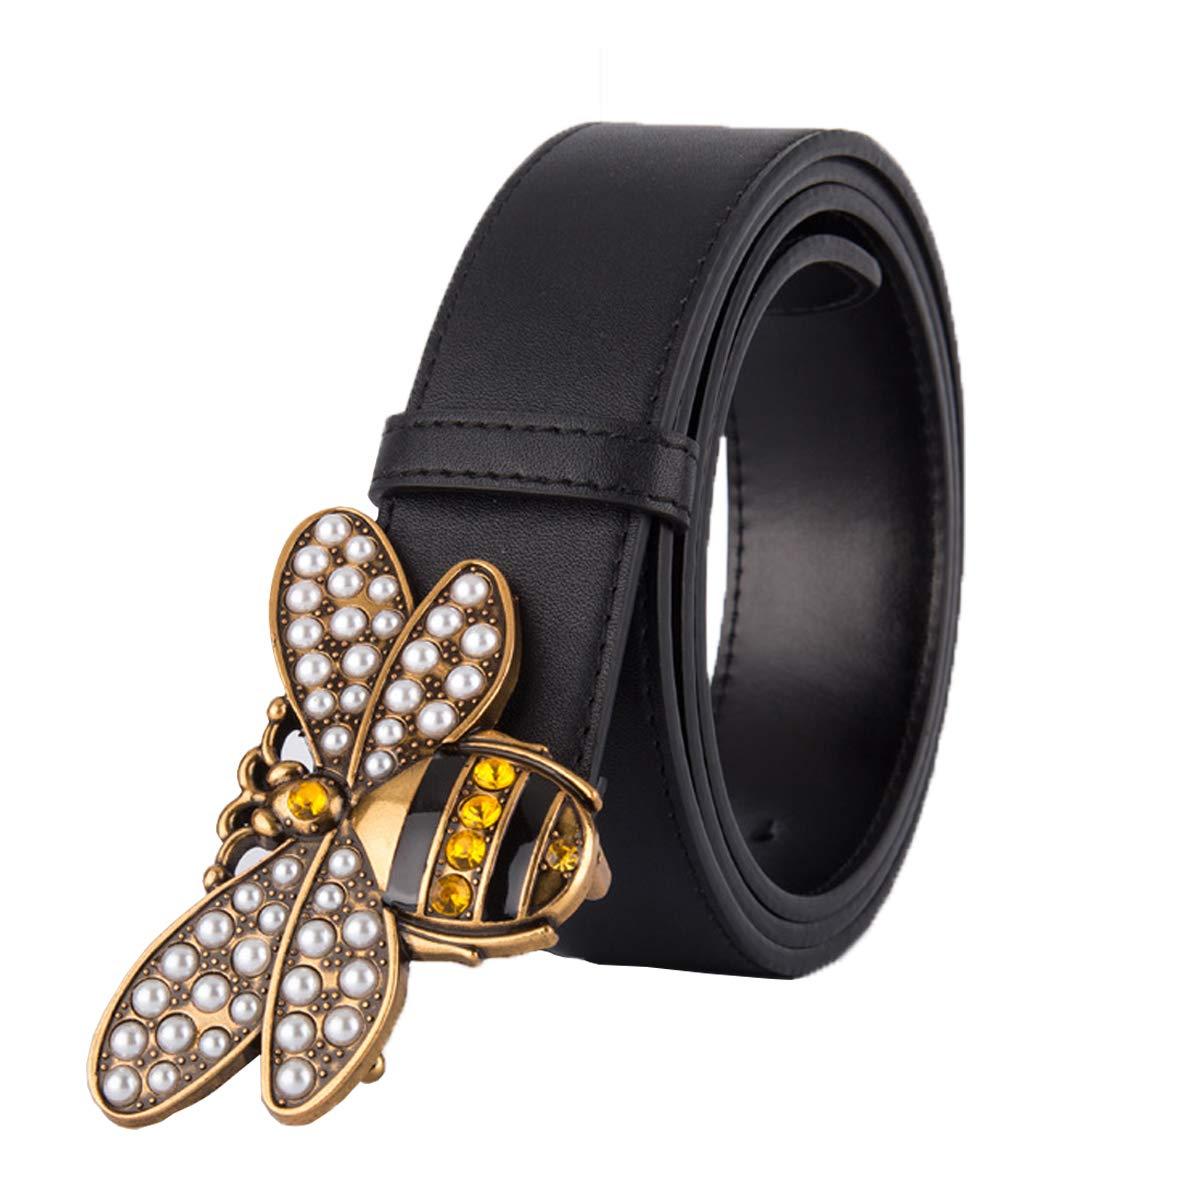 5d8ee1dba2a Womtop Women Belts Fashion Design Leather Pearl Buckle Belt Casual Business  Waist Belts (Red